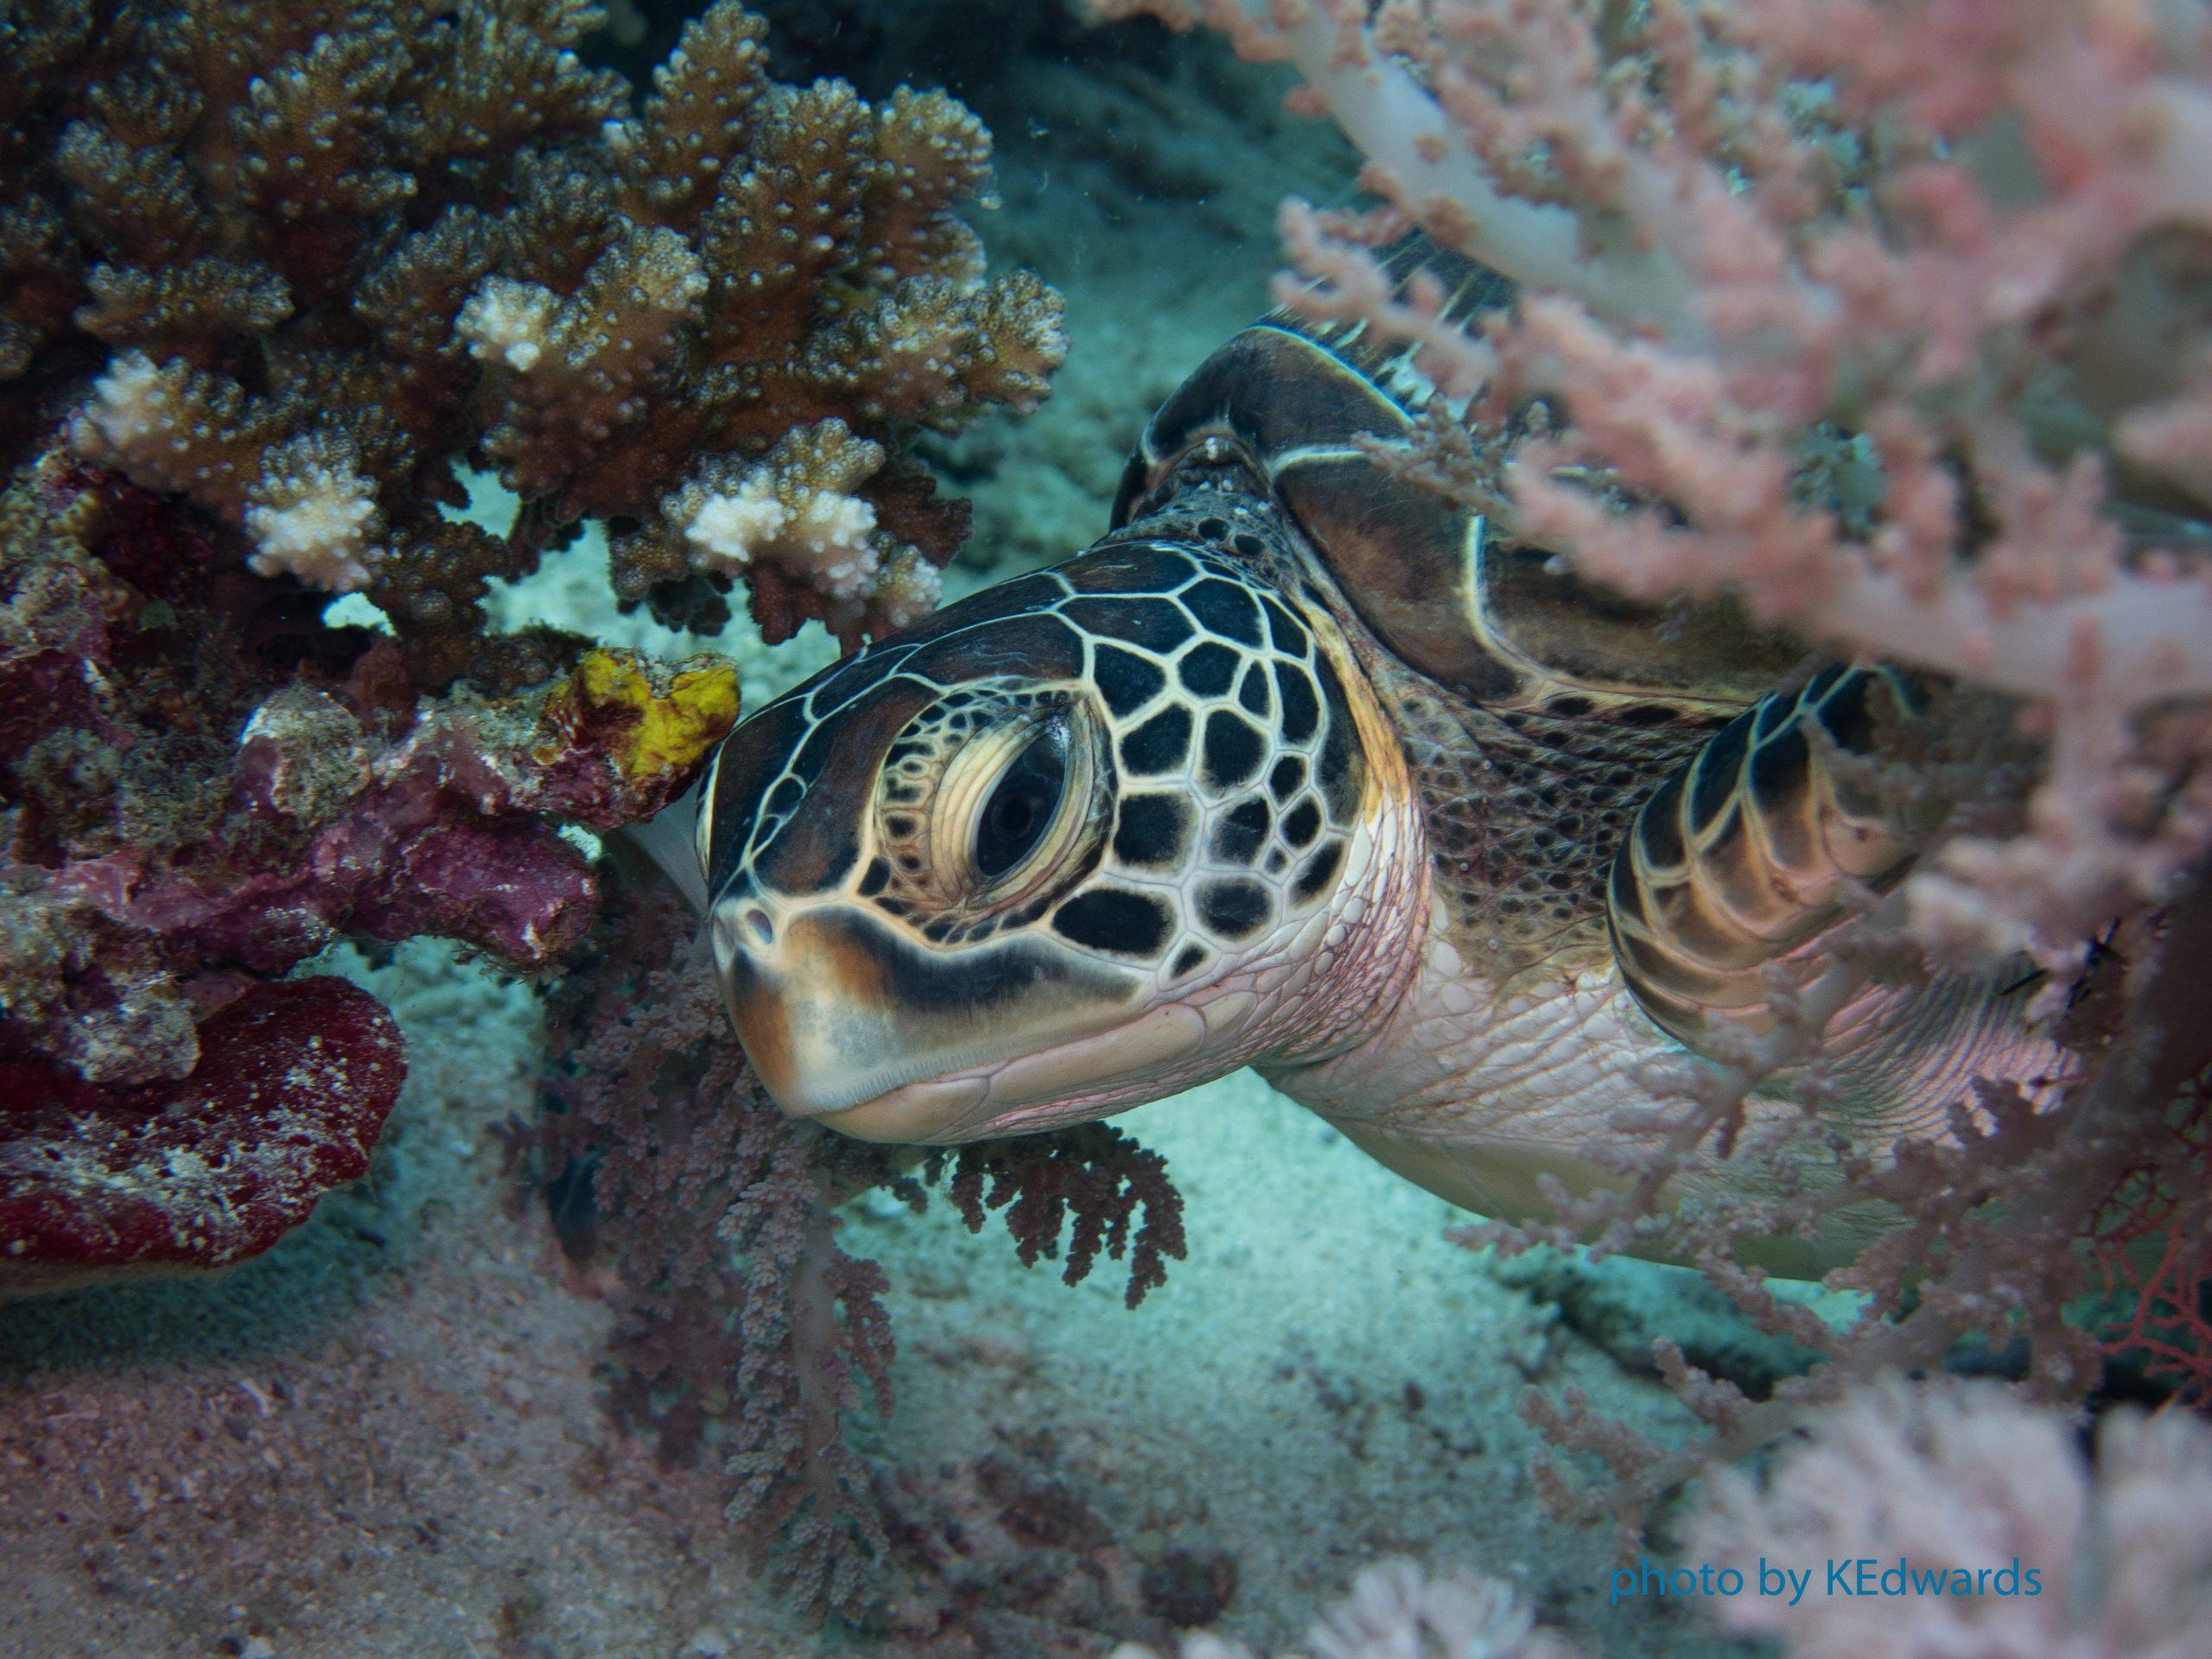 Hawksbill Turtle - photo taken in Apo Island, Philippines